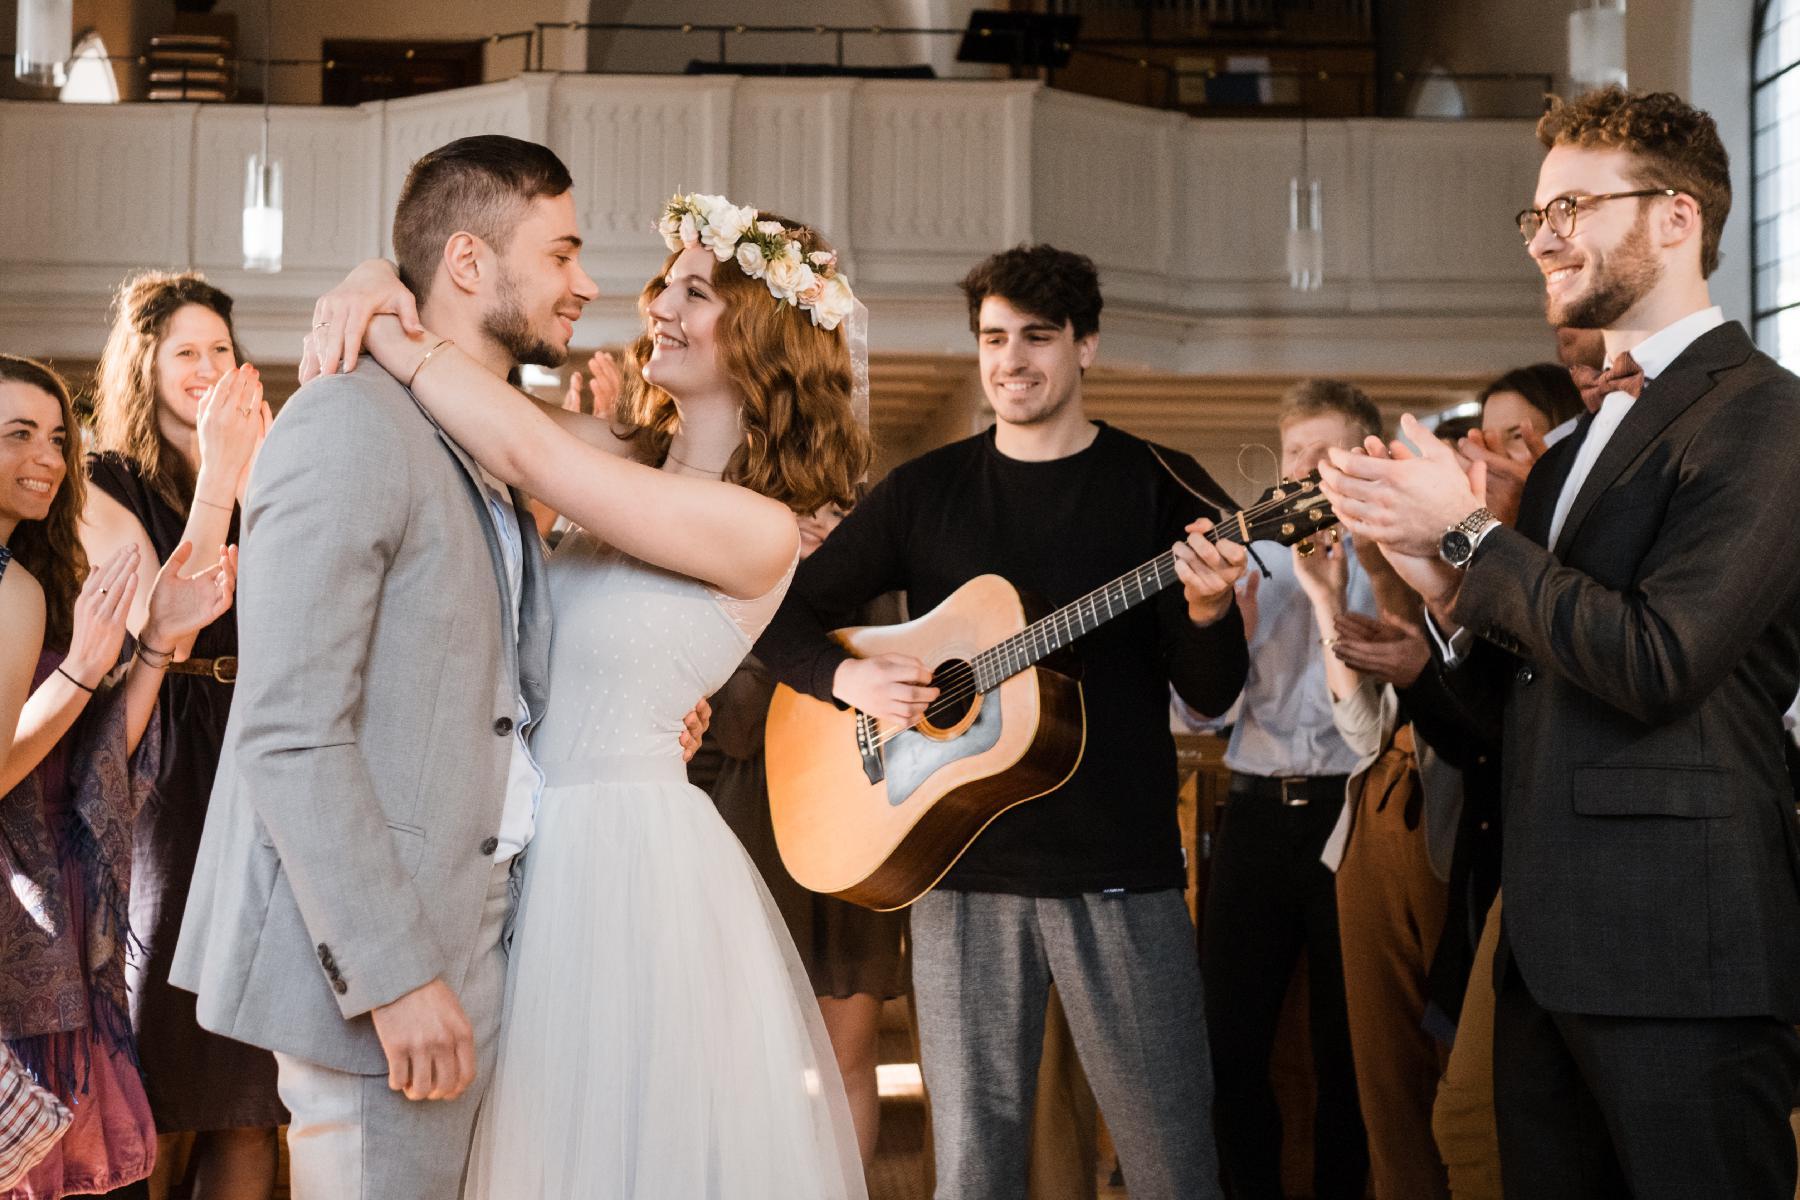 Ehepaar tanzt zu Live-Musik in Kirche